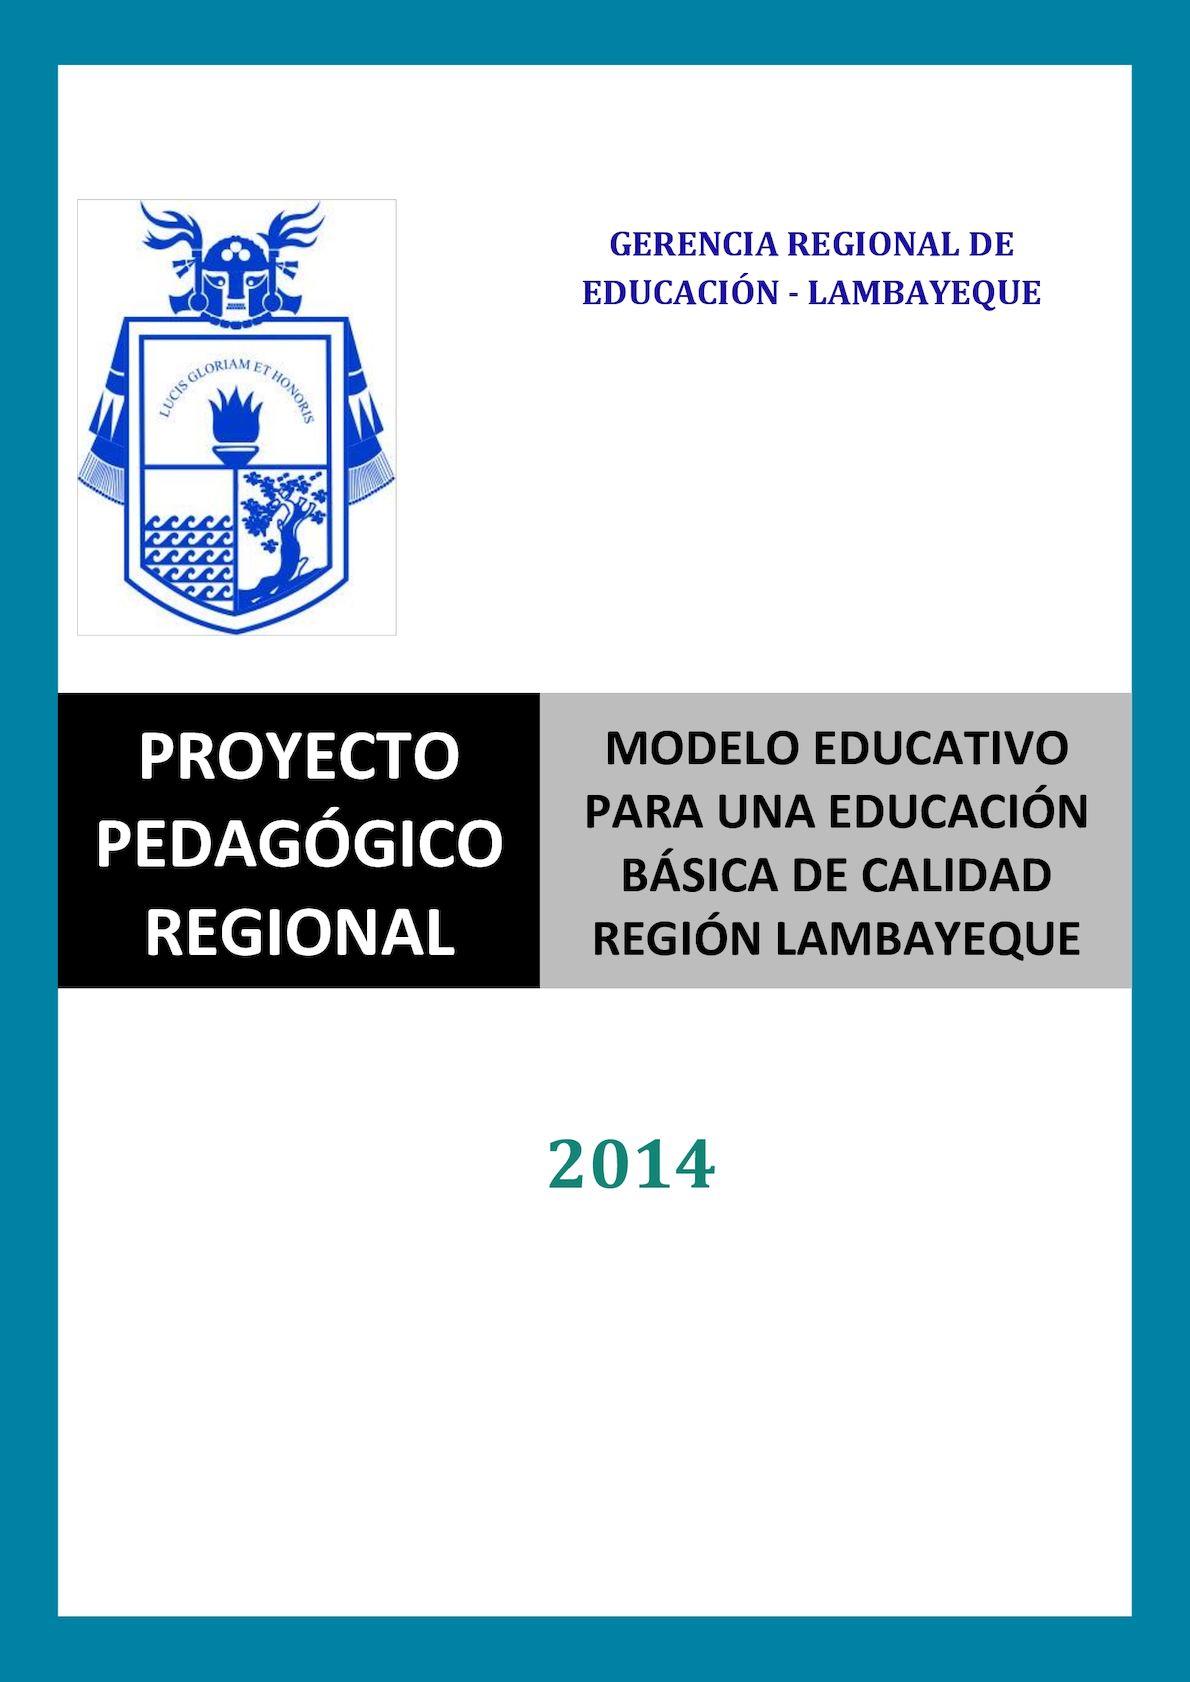 Calaméo - Proyecto Pedagogico Regional Lambayeque, 2014